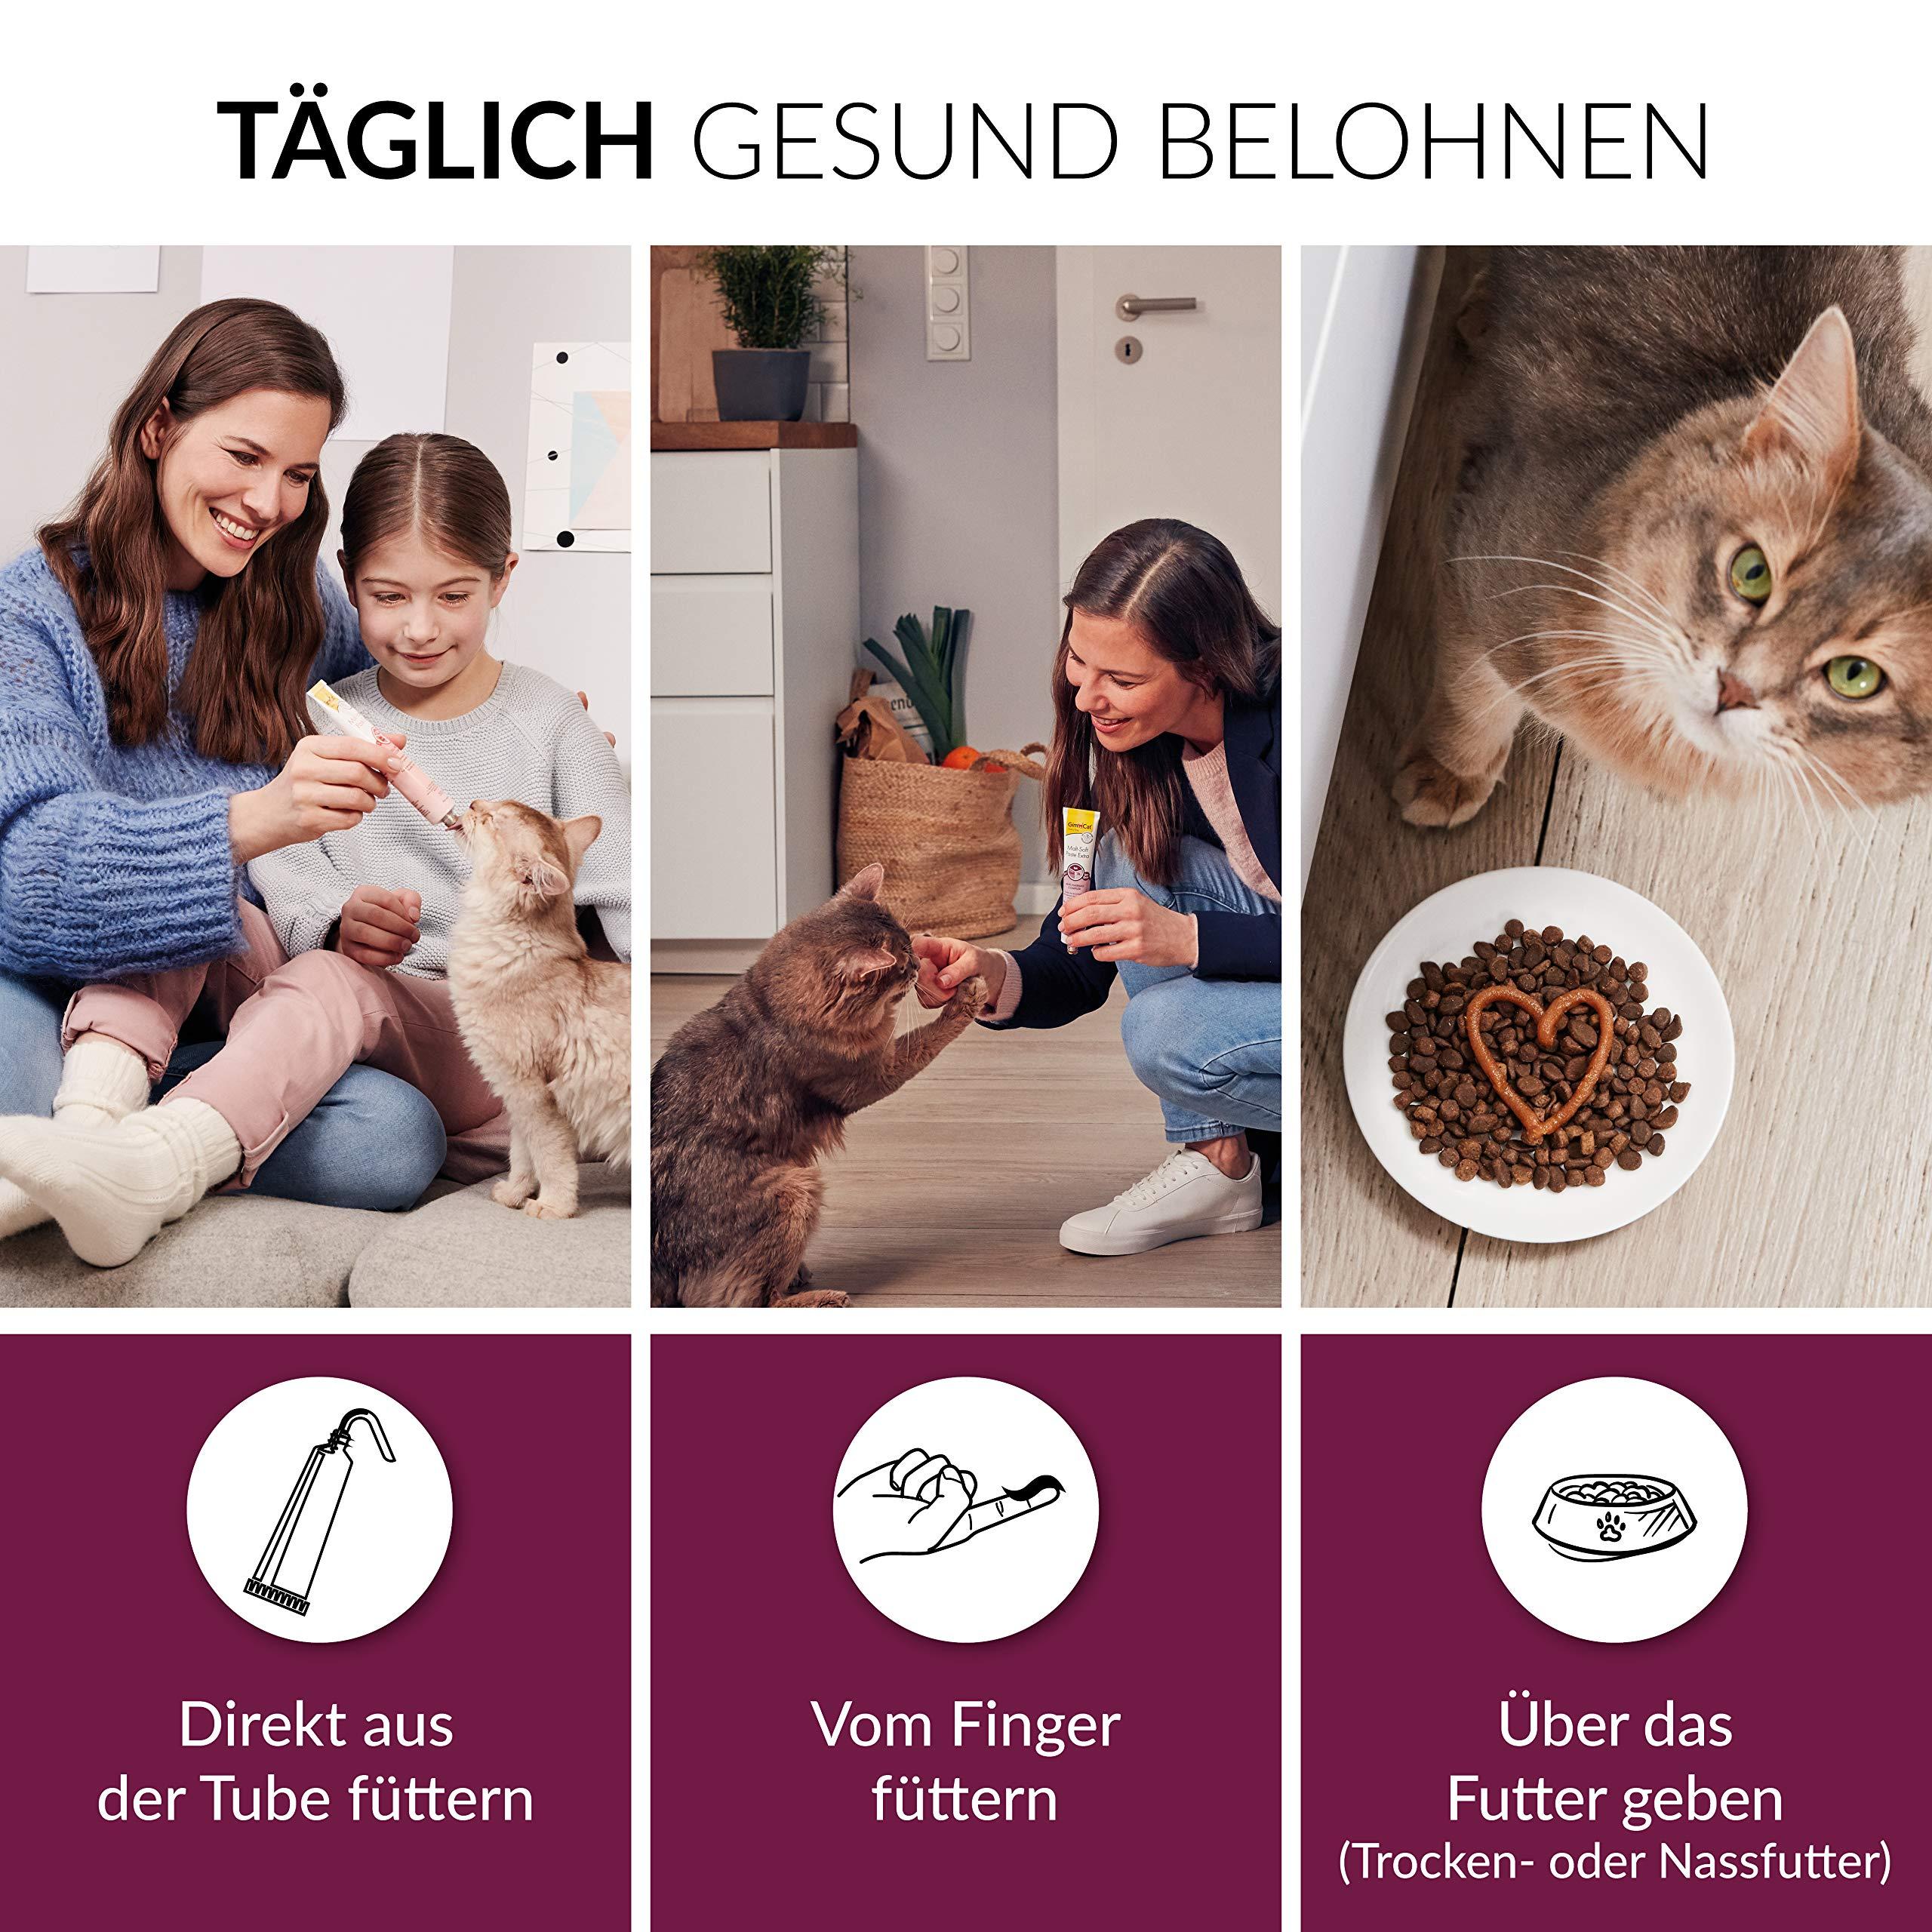 Gimcat Gimcat Malt Soft Extra 100G 1 Unidad 100 g: Amazon.es: Productos para mascotas